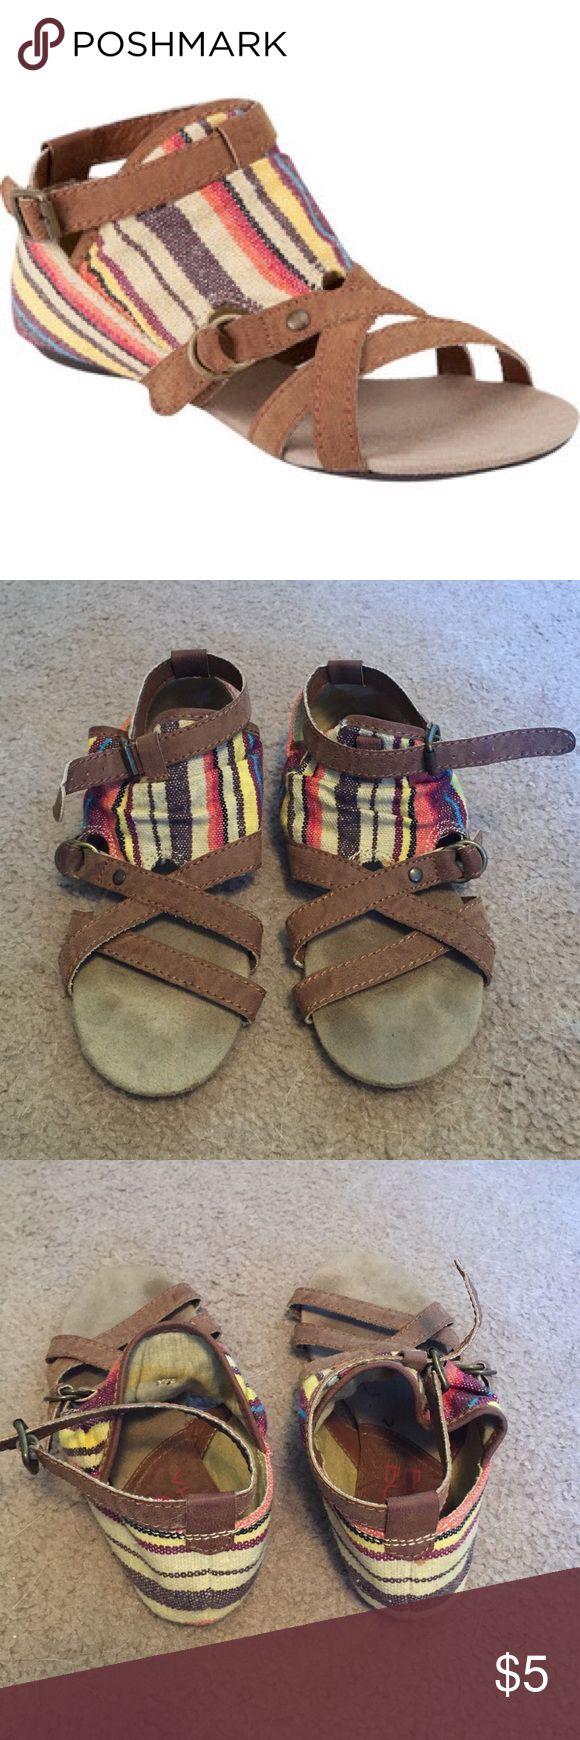 Big Buddha Sandals Super cute!! Worn once or twice Big Buddha Shoes Sandals